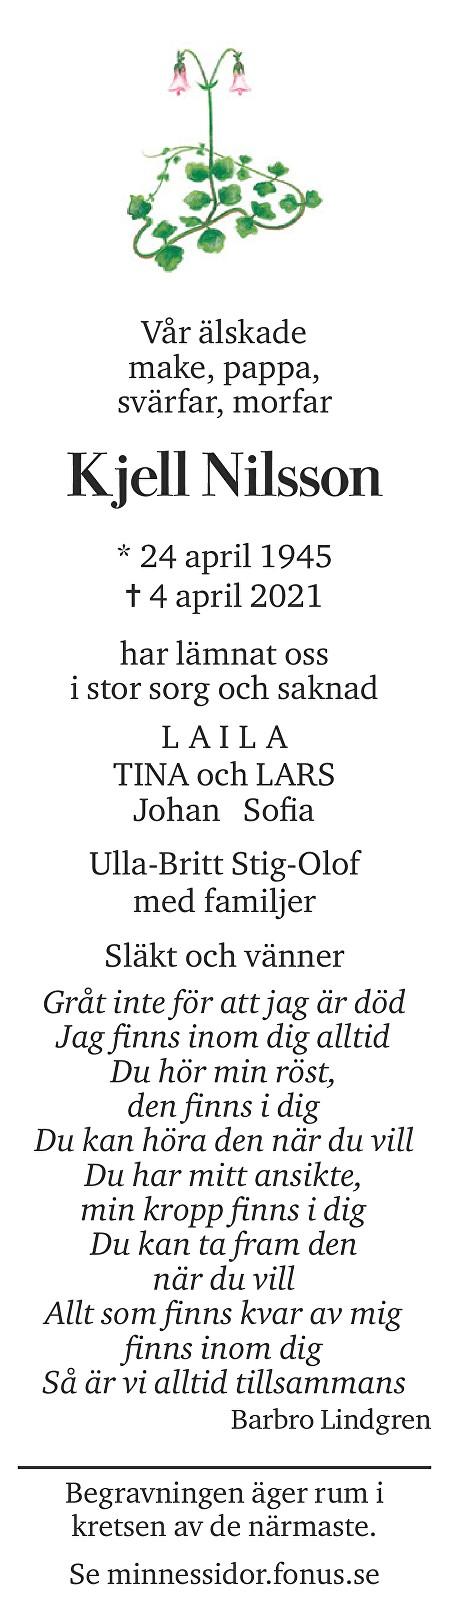 Kjell Nilsson Death notice